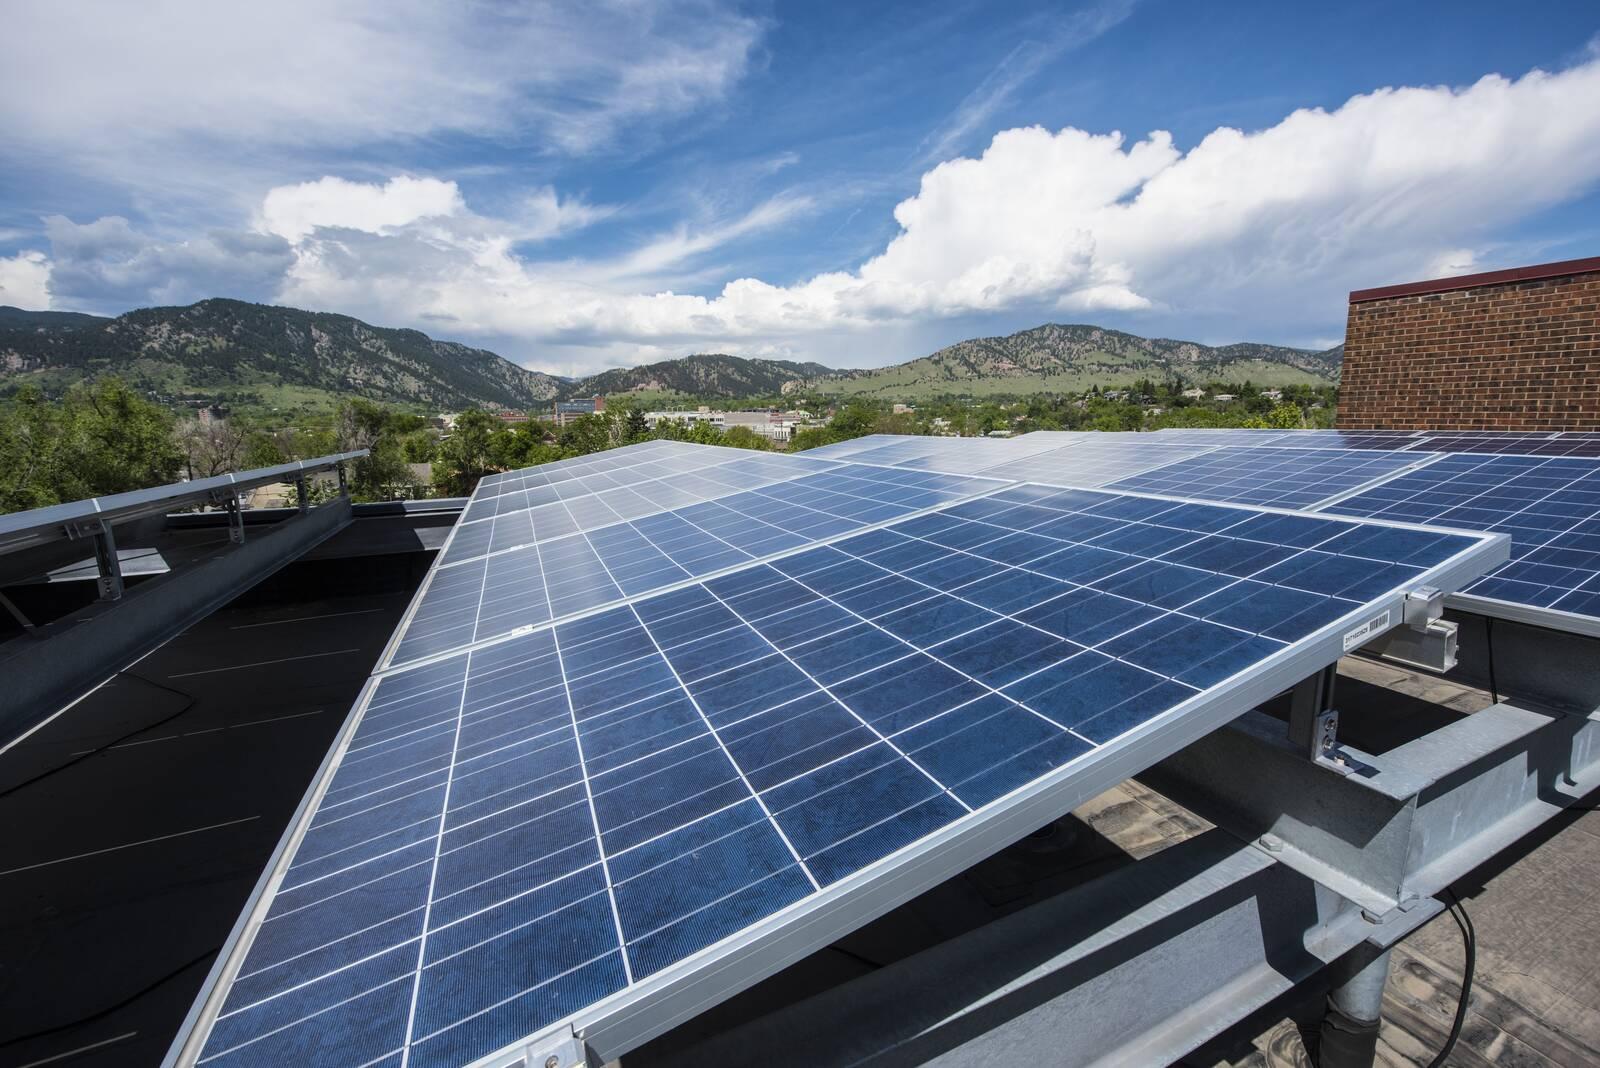 Solar panels on a senior housing complex in Boulder, Colorado. Credit: Dennis Schroeder/NREL